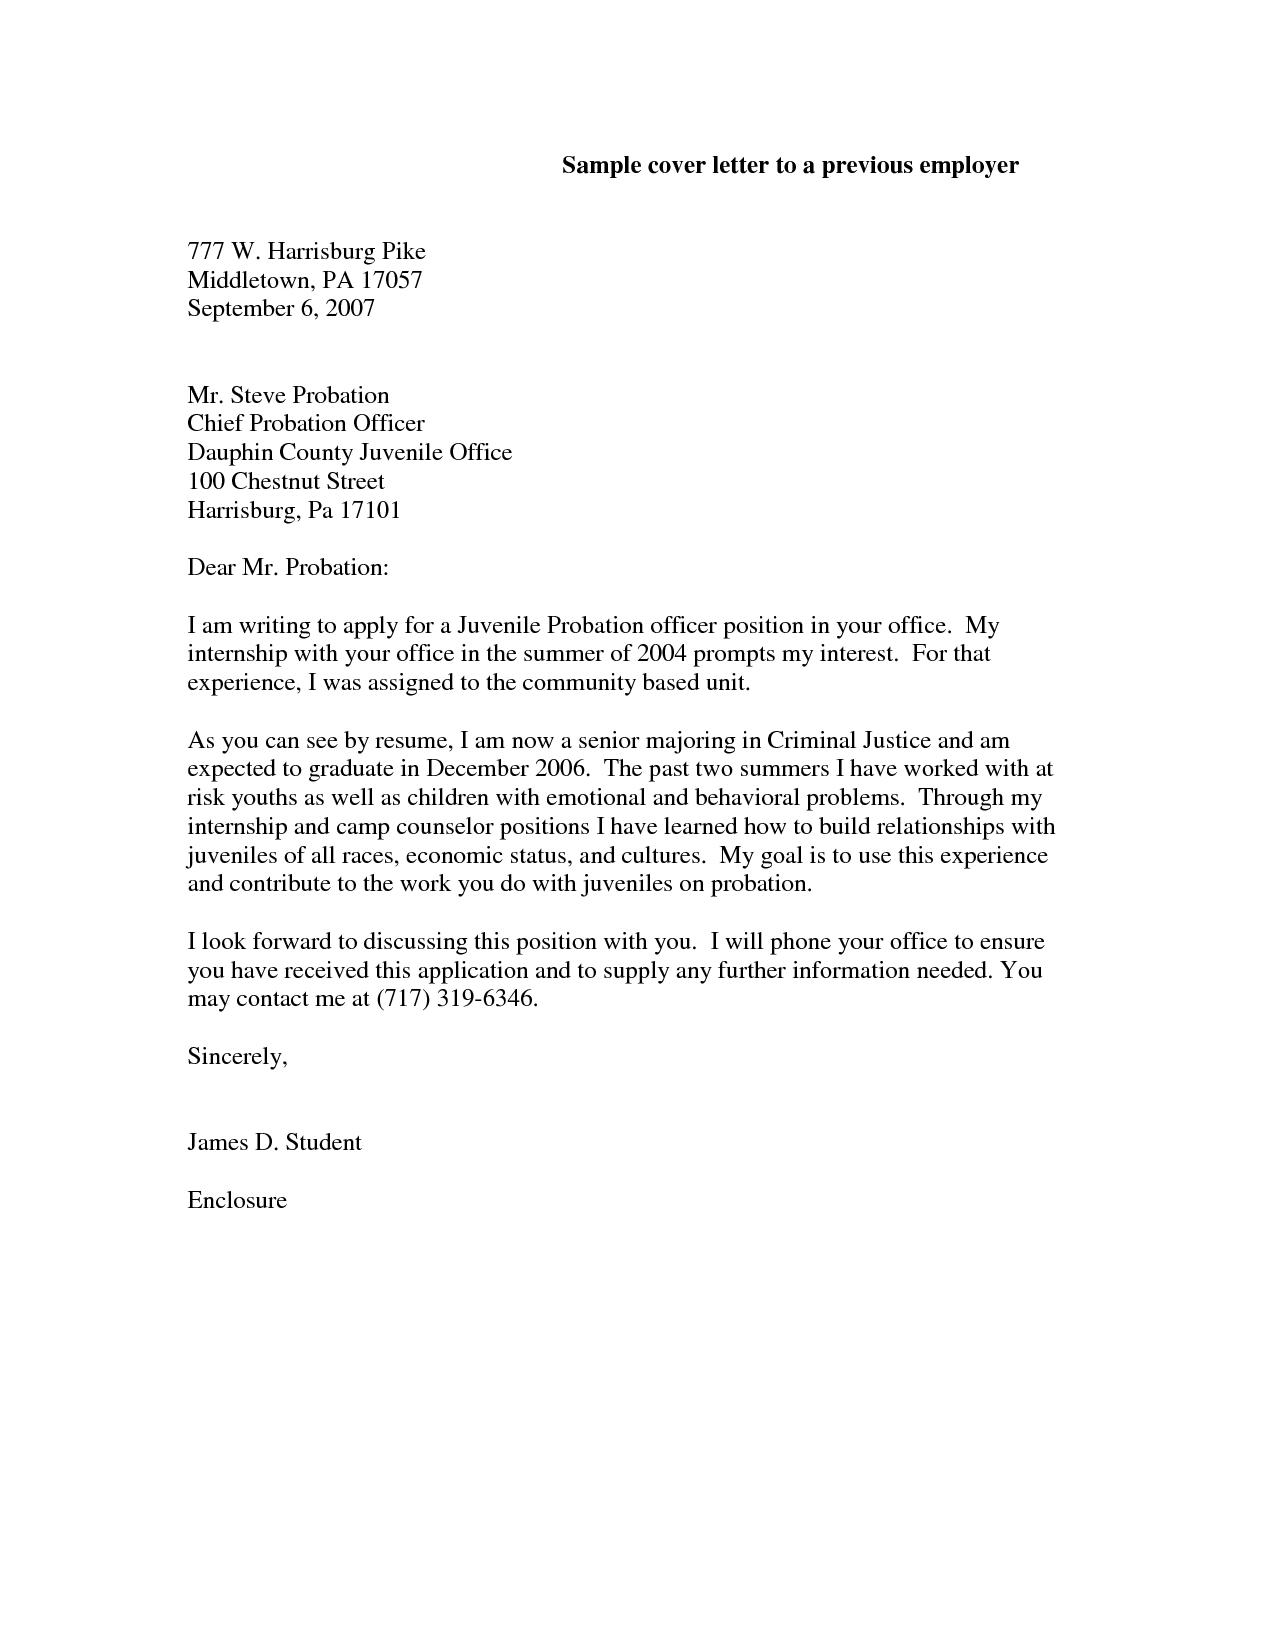 Juvenile Detention Officer Resume Examplecareer Resume Template Career Resume Template